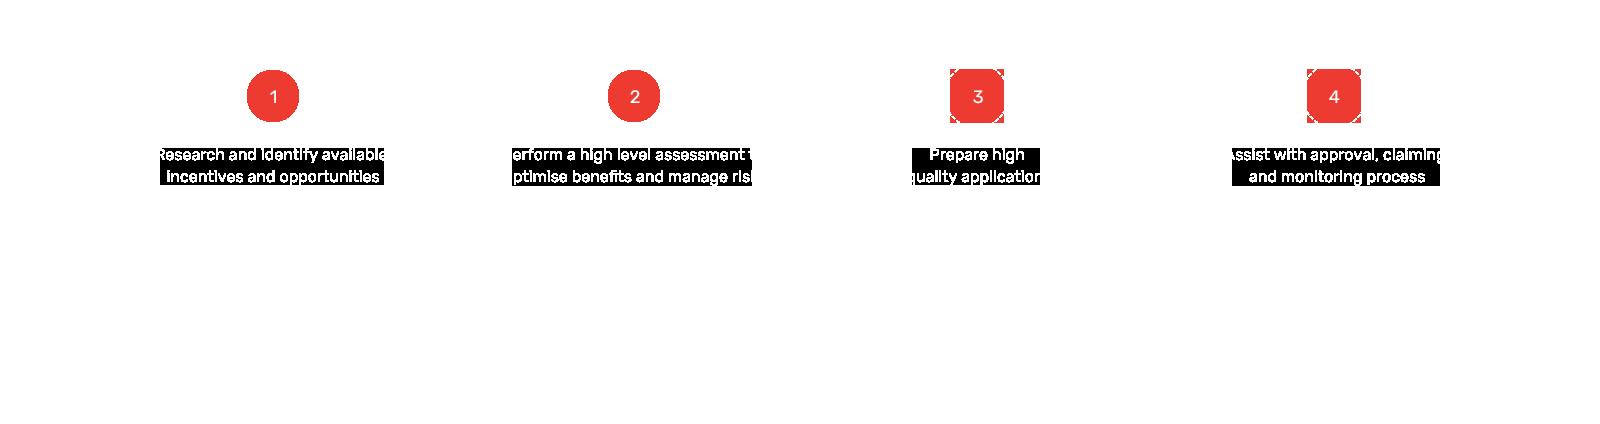 Catalyst---Service---Our-process2-copy